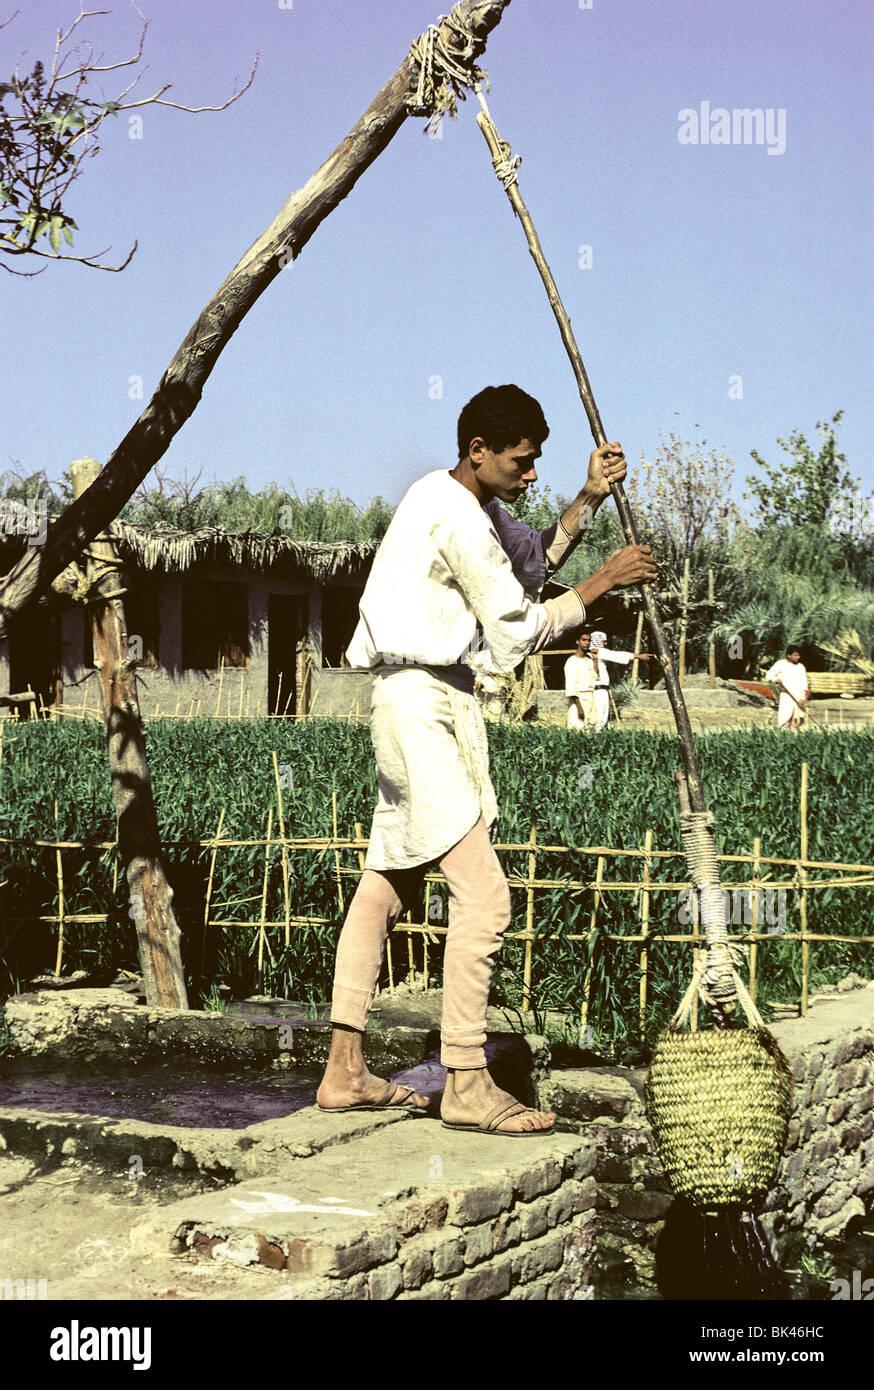 Egyptian Man Using A Shadoof (historic Irrigation Tool) At